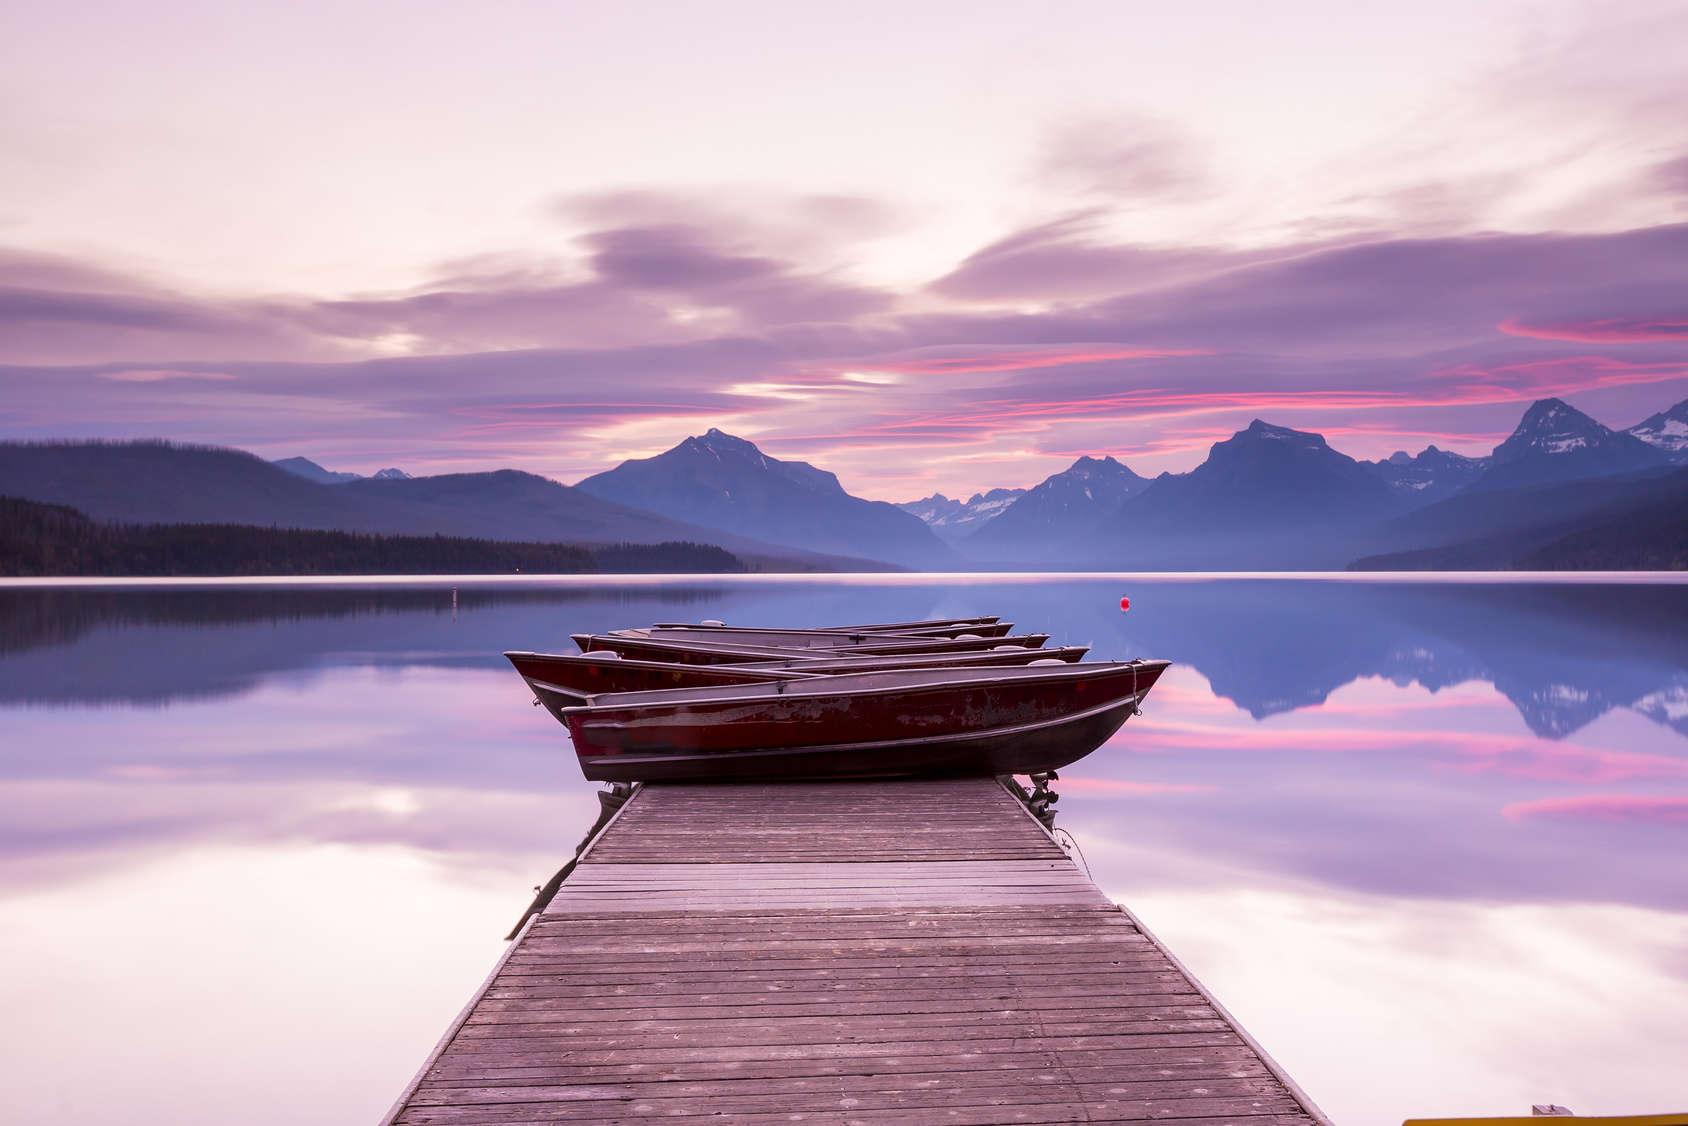 Boats sit on the dock at Lake McDonald at twilight. Glacier National Park, Montana.